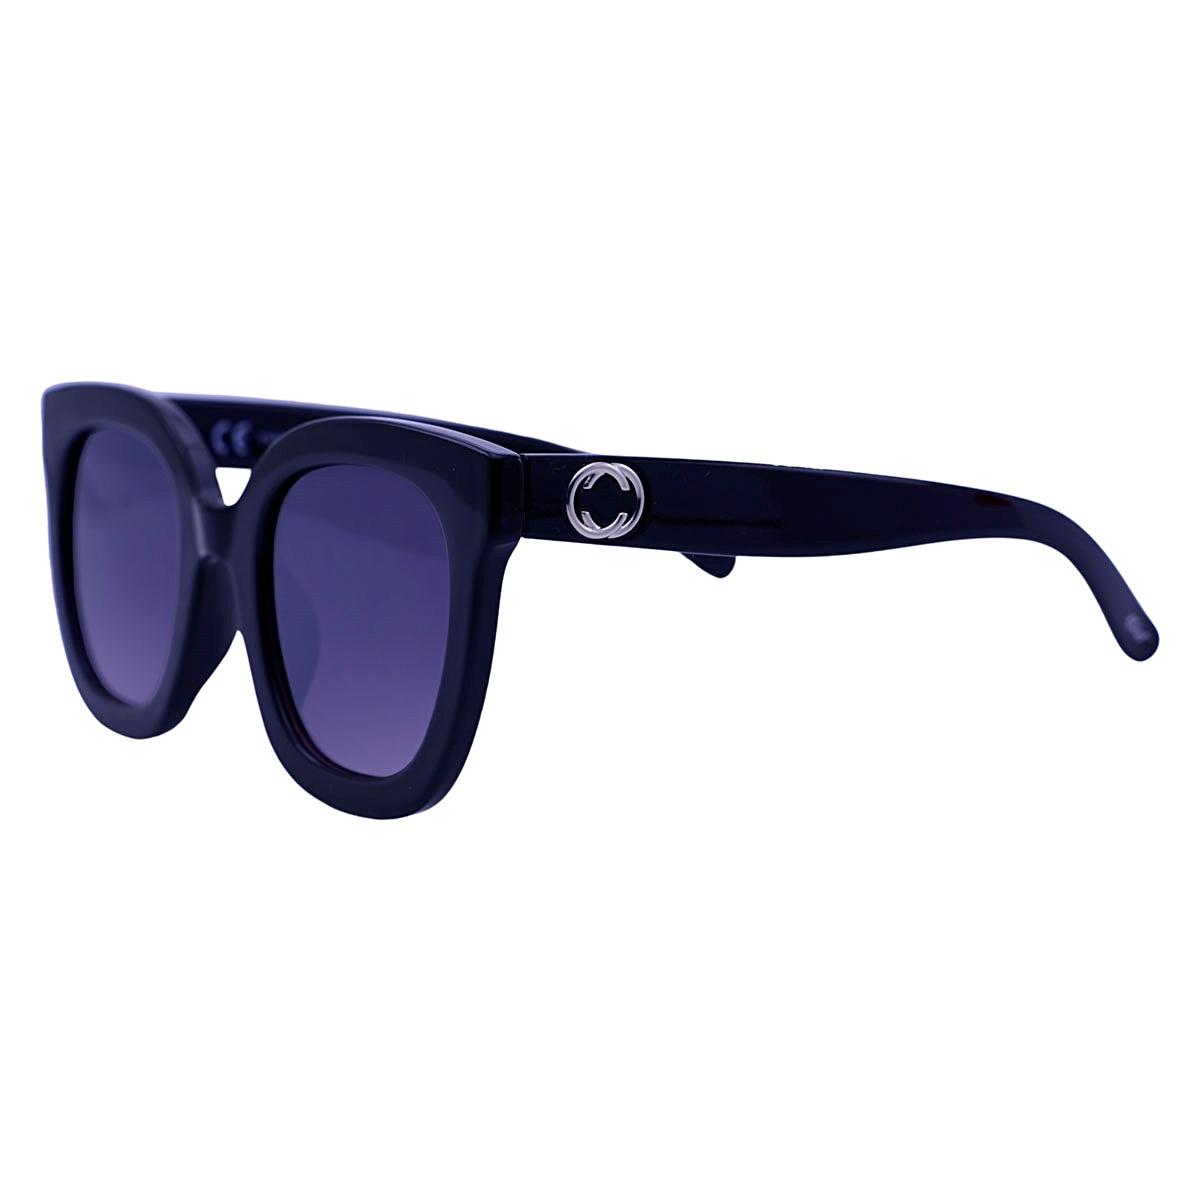 Óculos De Sol Tilit Feminino Acetato Oversize - Preto